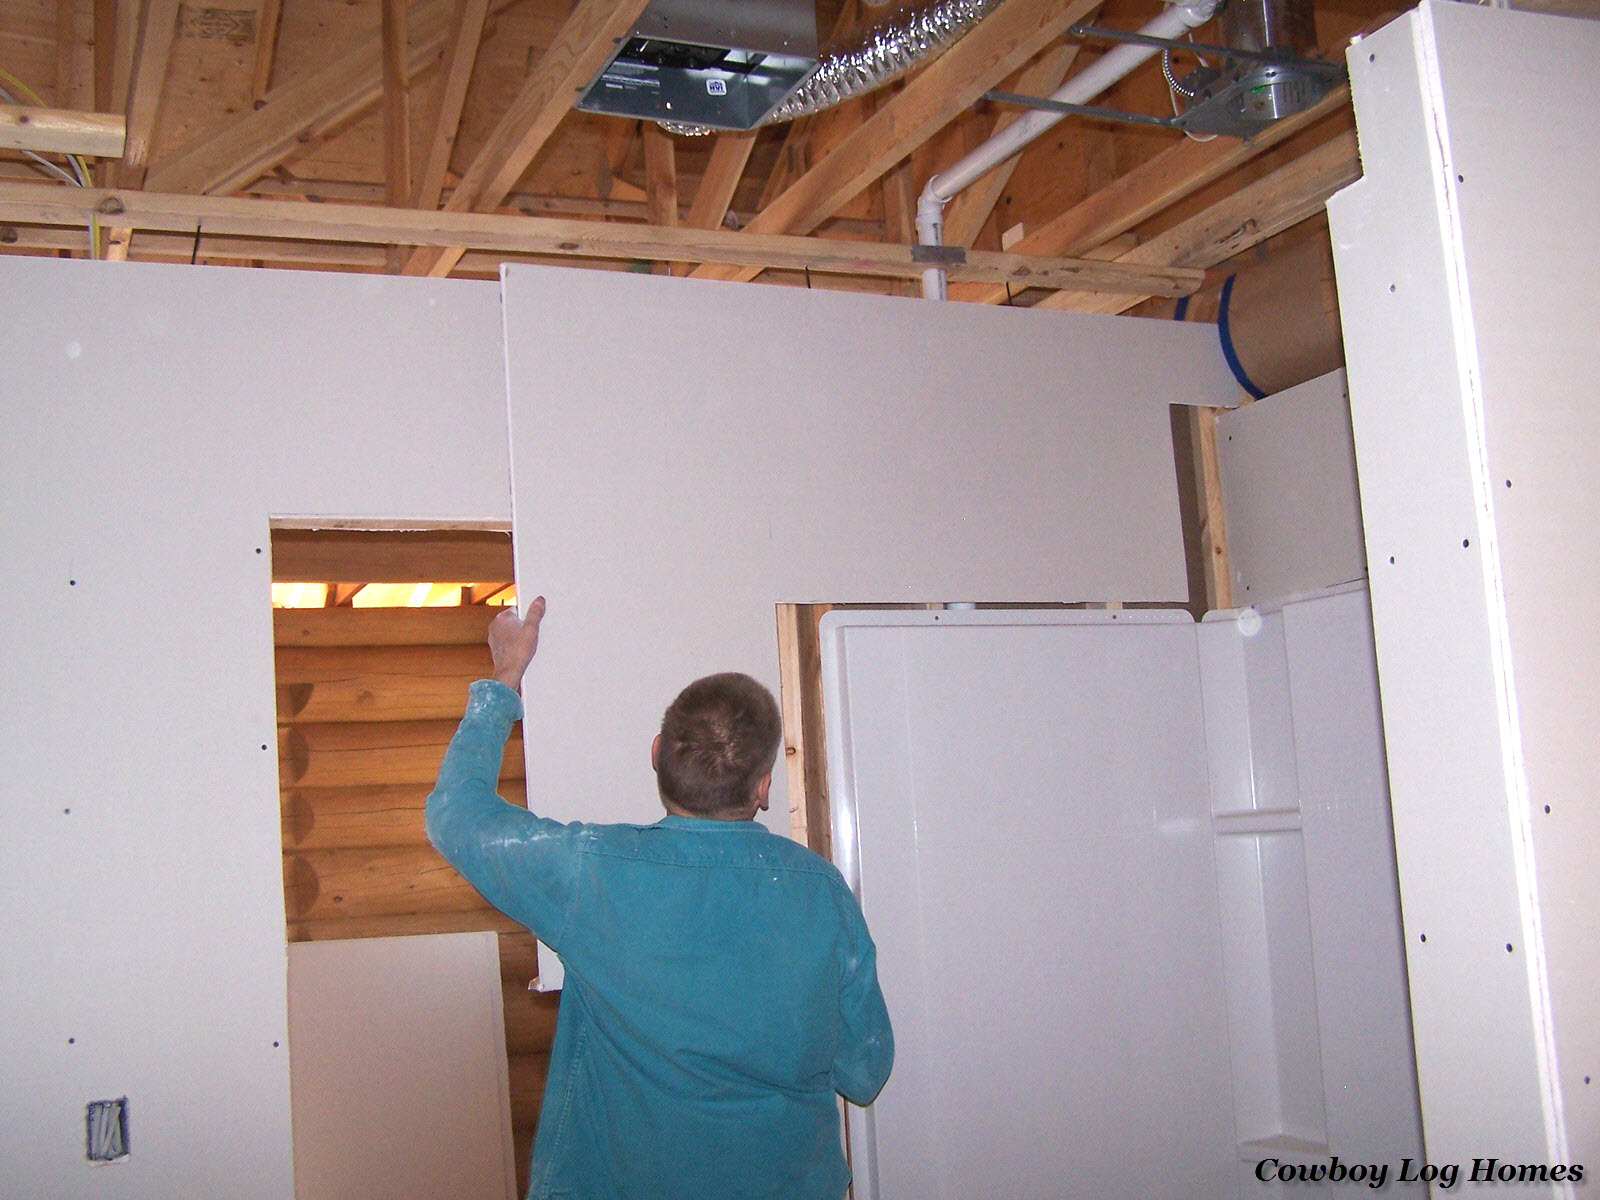 Sept 20th Drywall Hanging Log Home